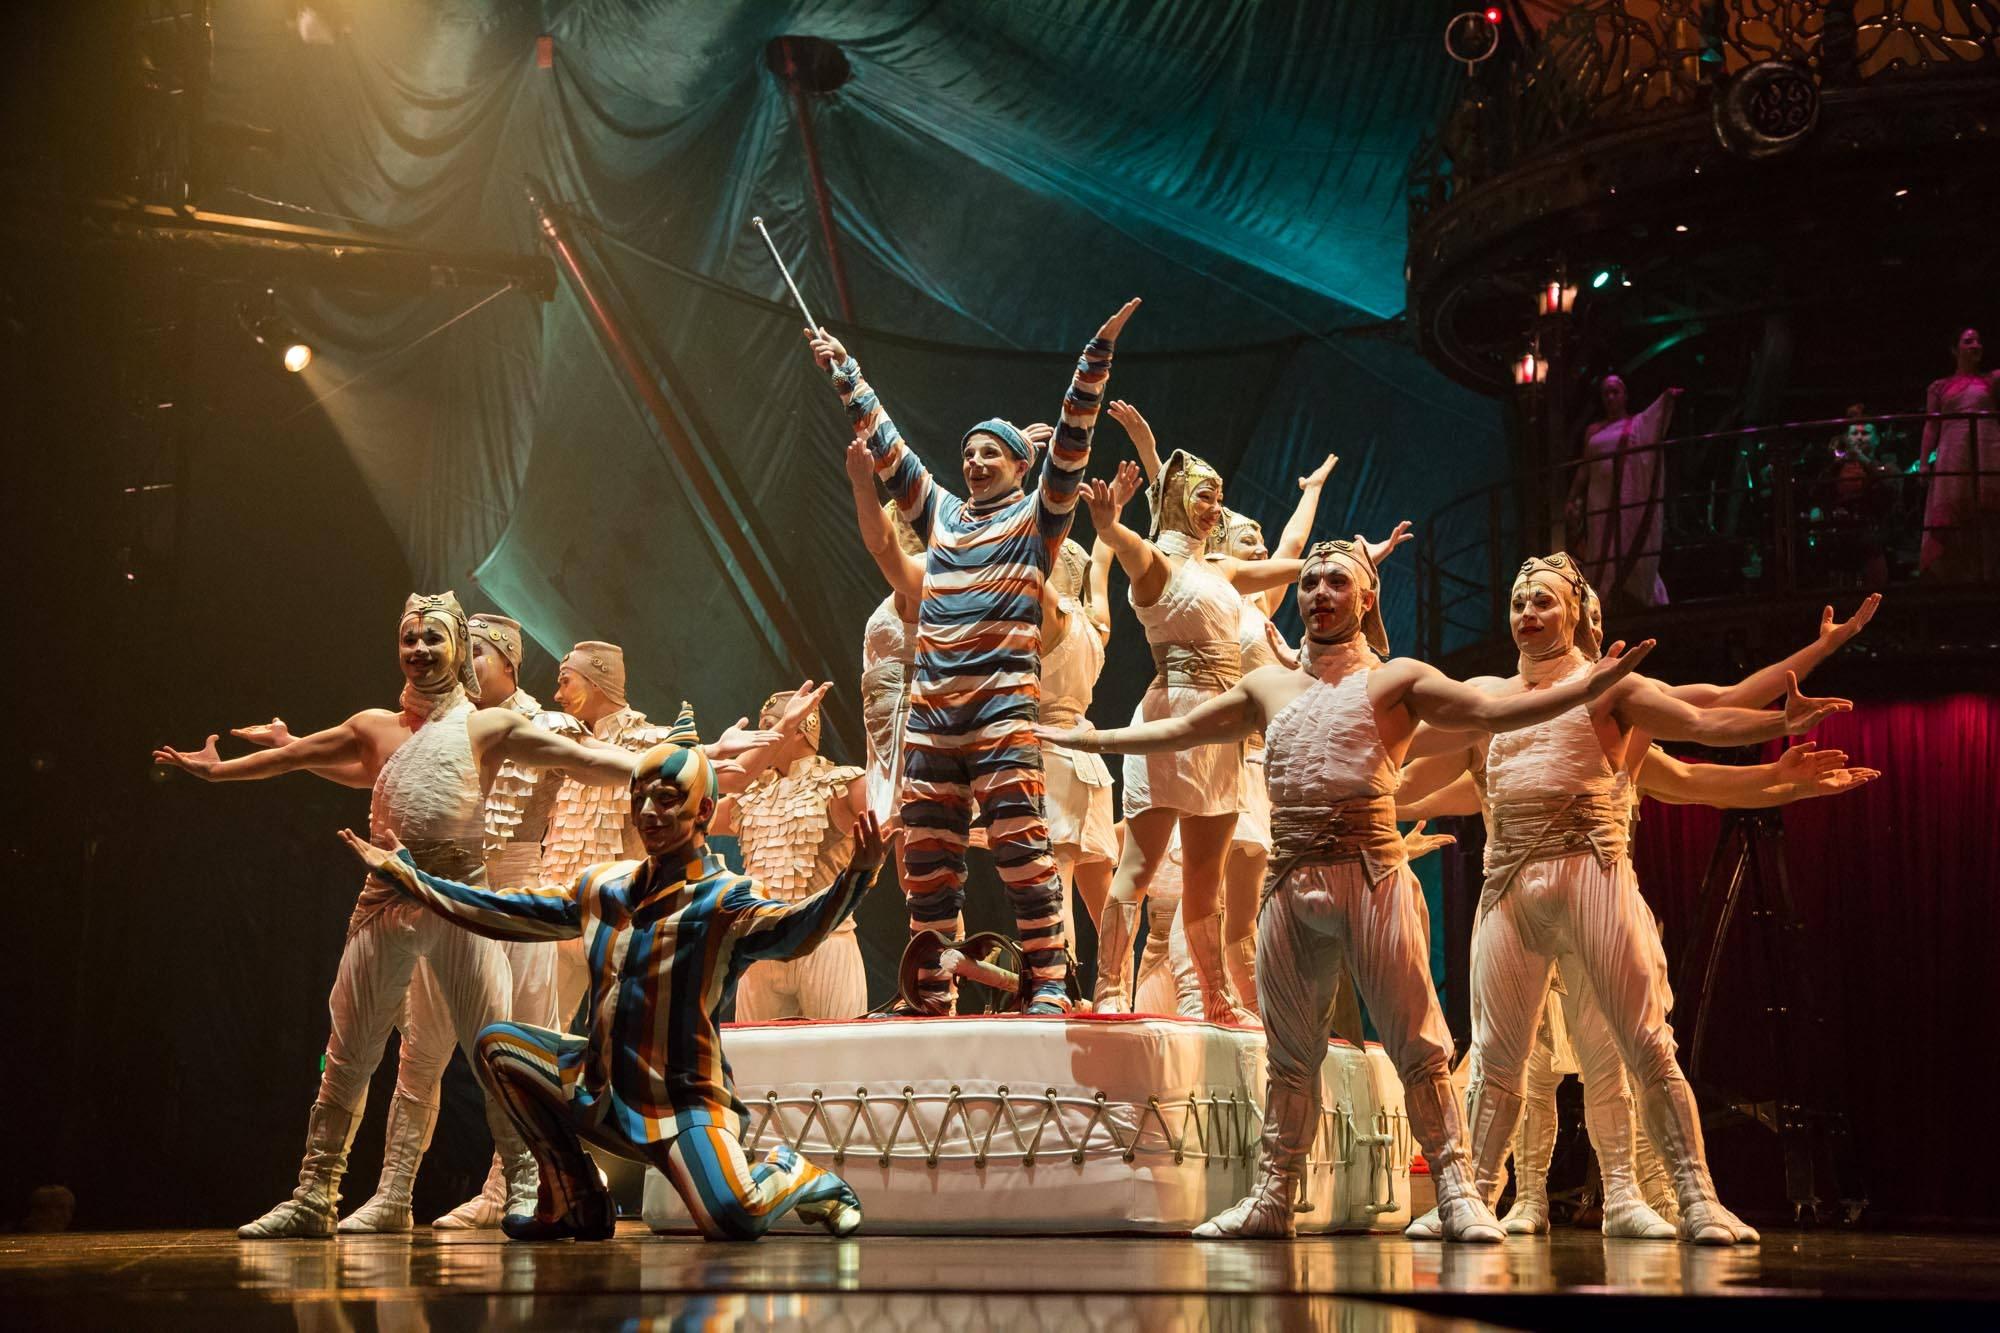 Cirque du Soleil's Kooza under the Big Top, Vancouver, Oct 28 2015. Kirk Chantraine photo.